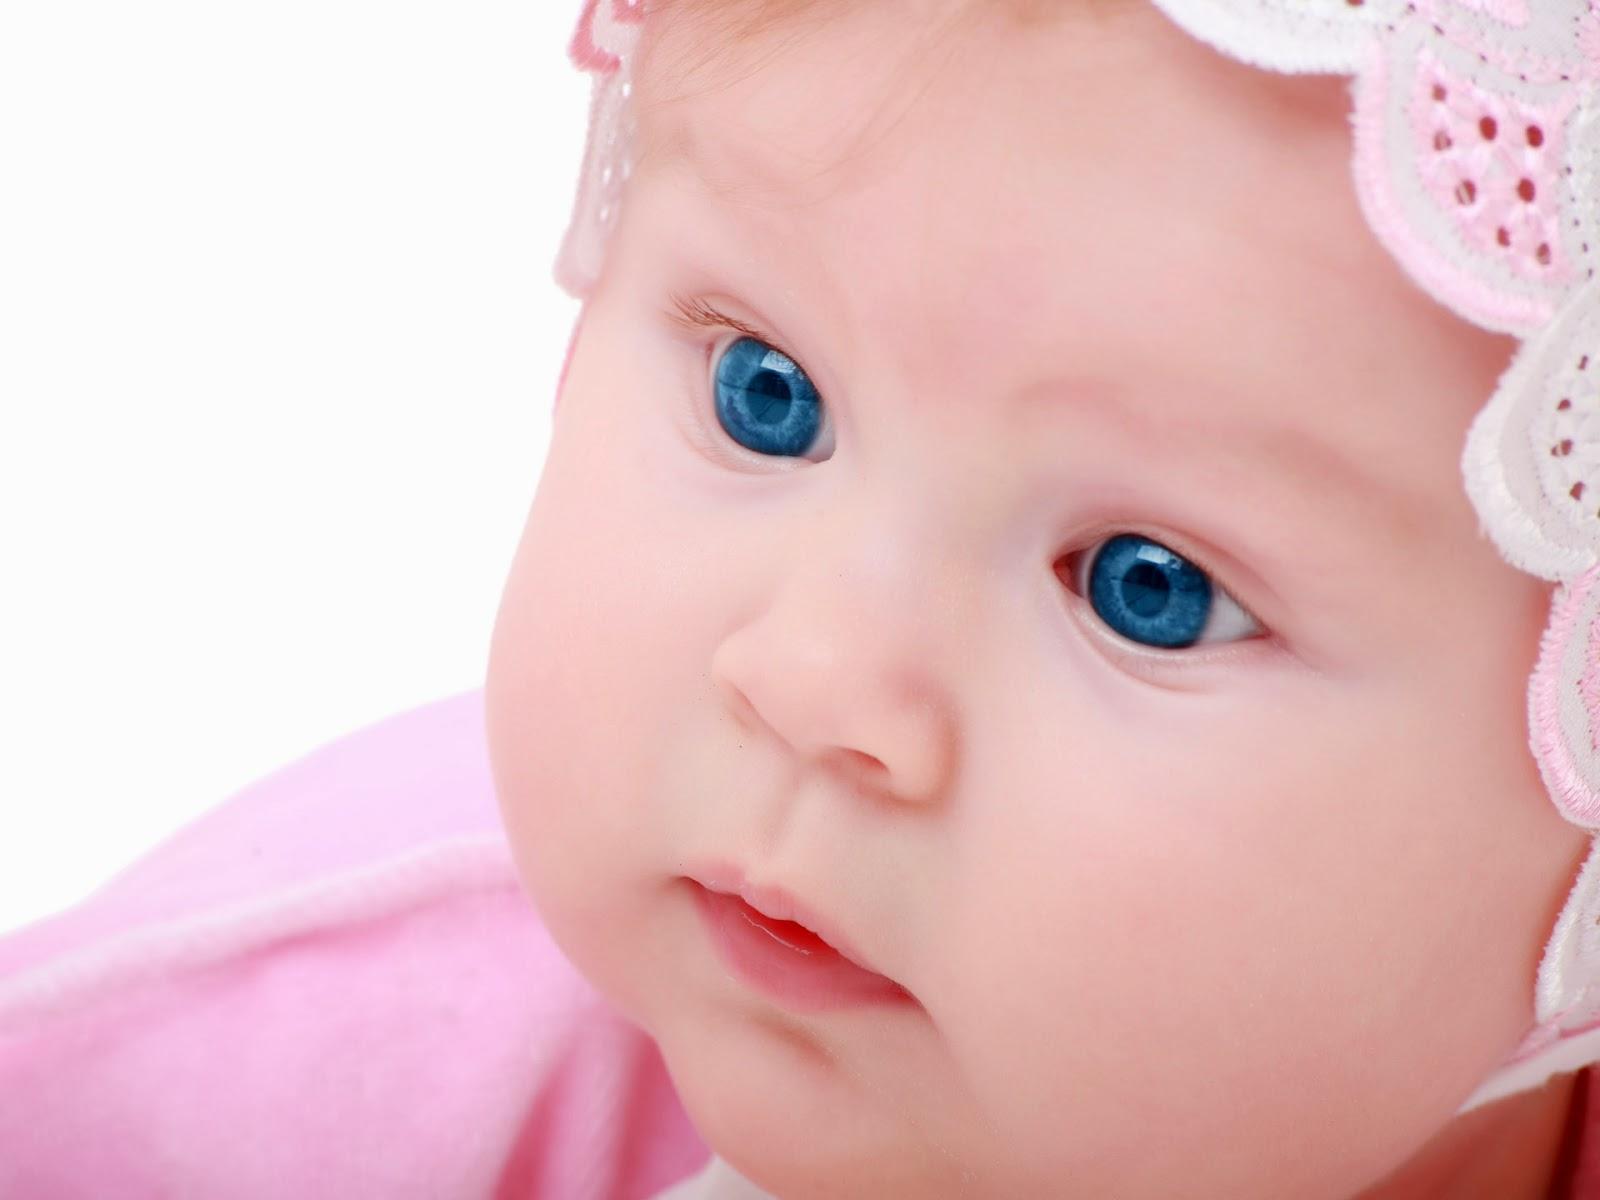 Hd Wallpapers Blog: Angel Baby girl Hd Wallpapers